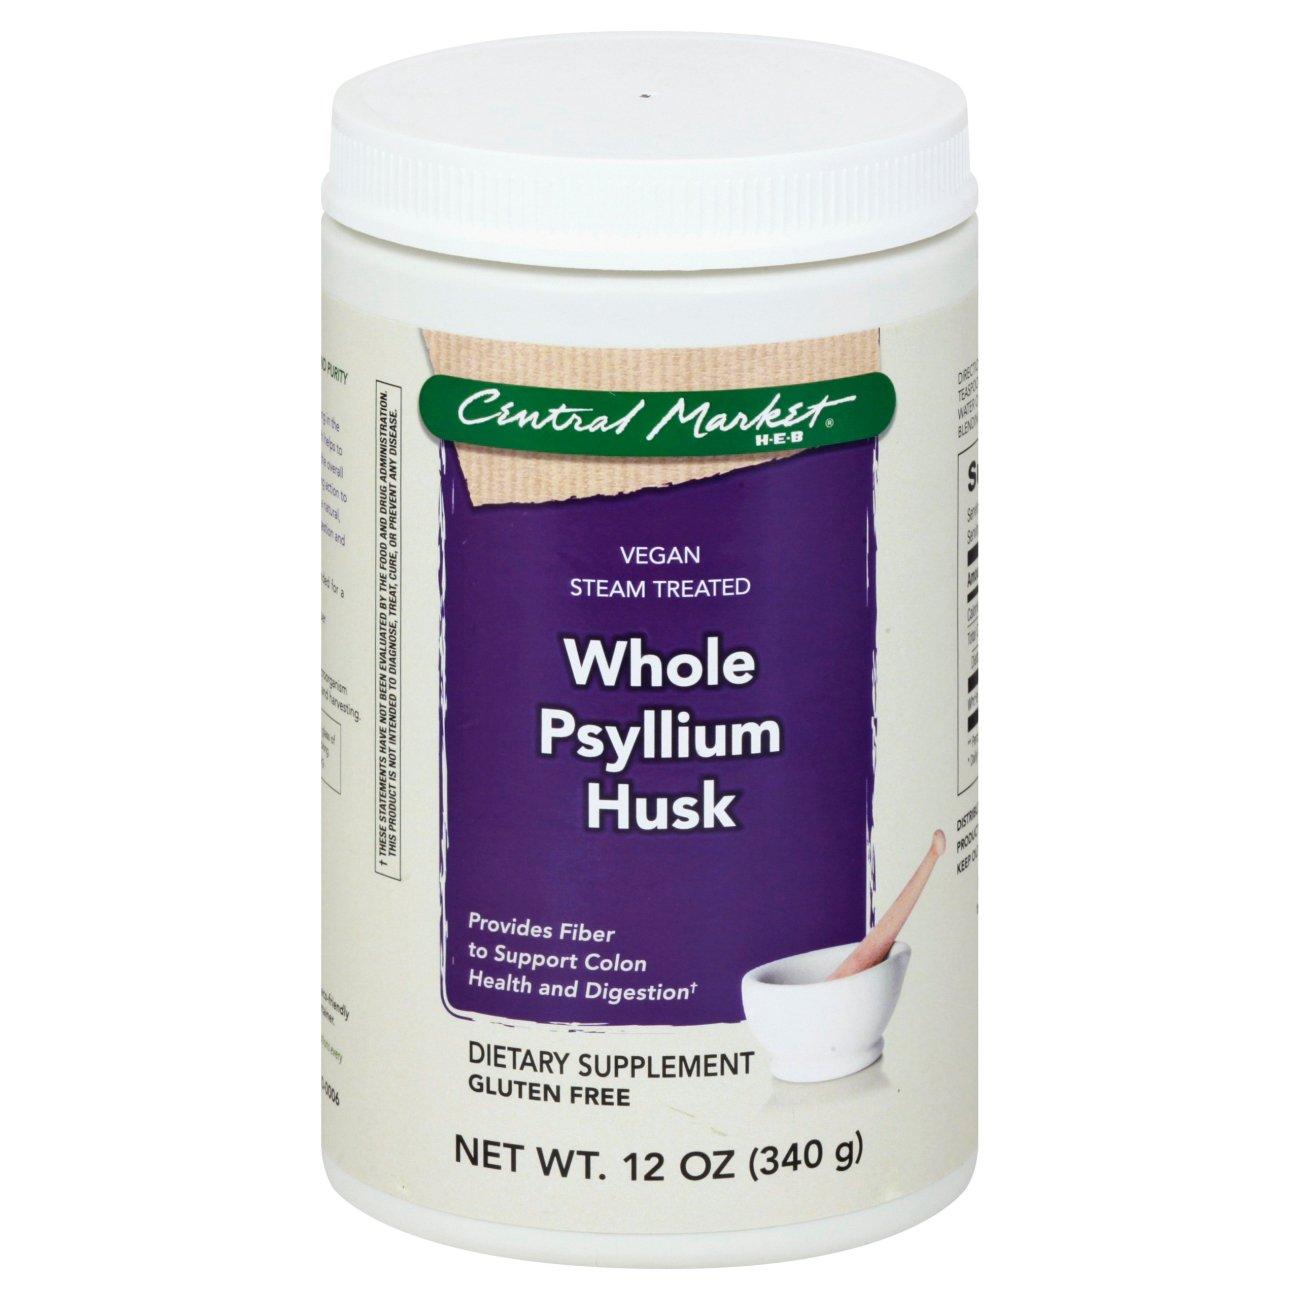 central market vegan steam treated whole psyllium husk shop